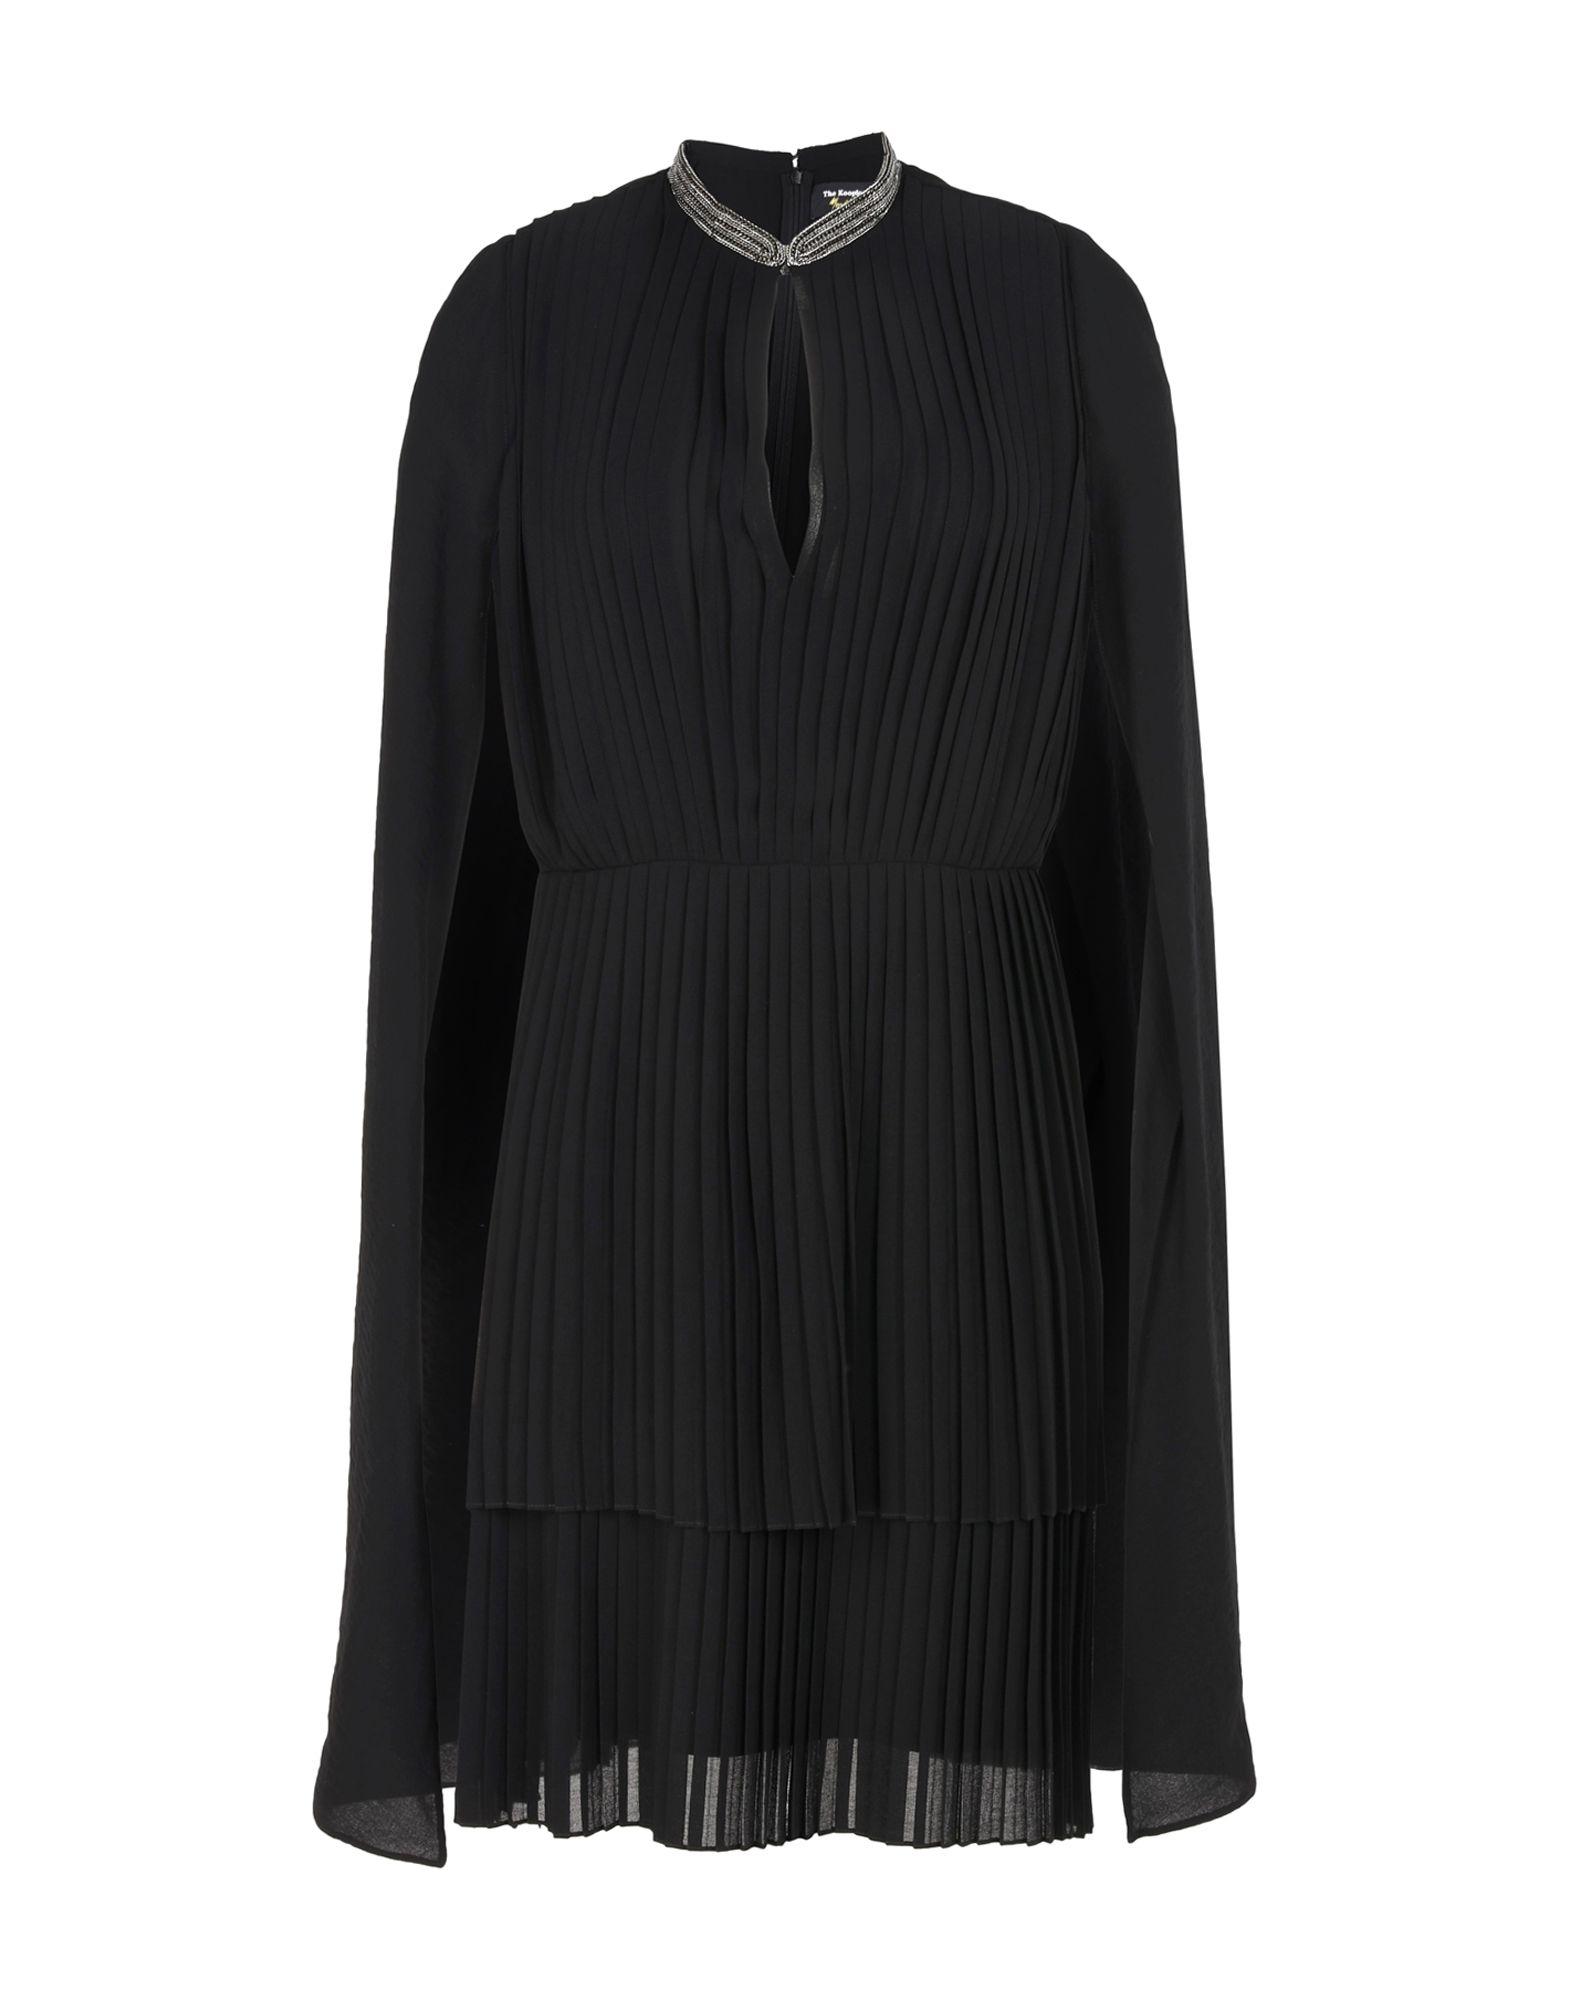 THE KOOPLES Damen Kurzes Kleid Farbe Schwarz Größe 2